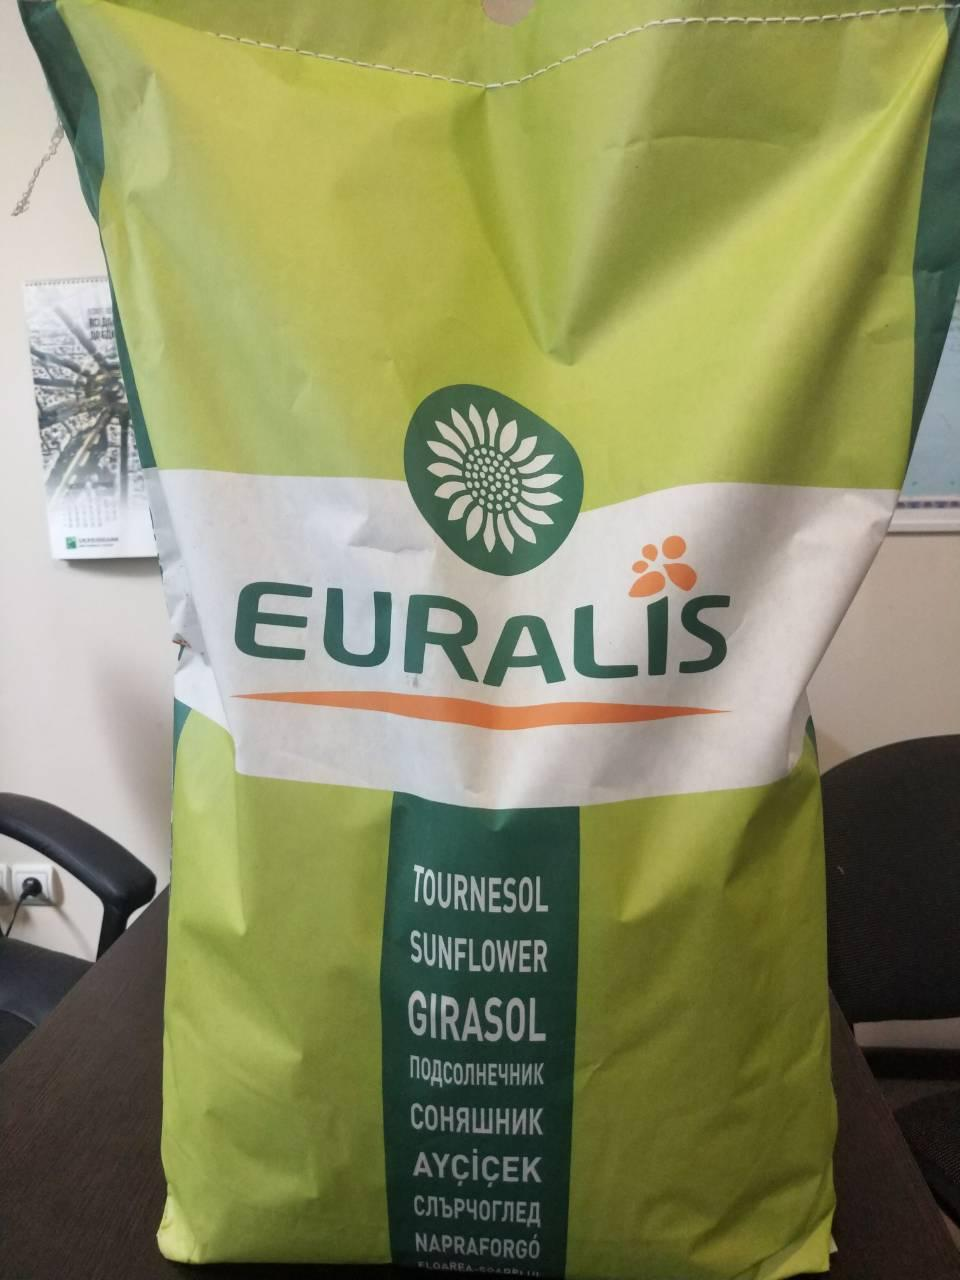 Euralis Евралис ЕС Каприз СЛП Евро-лайтнинг